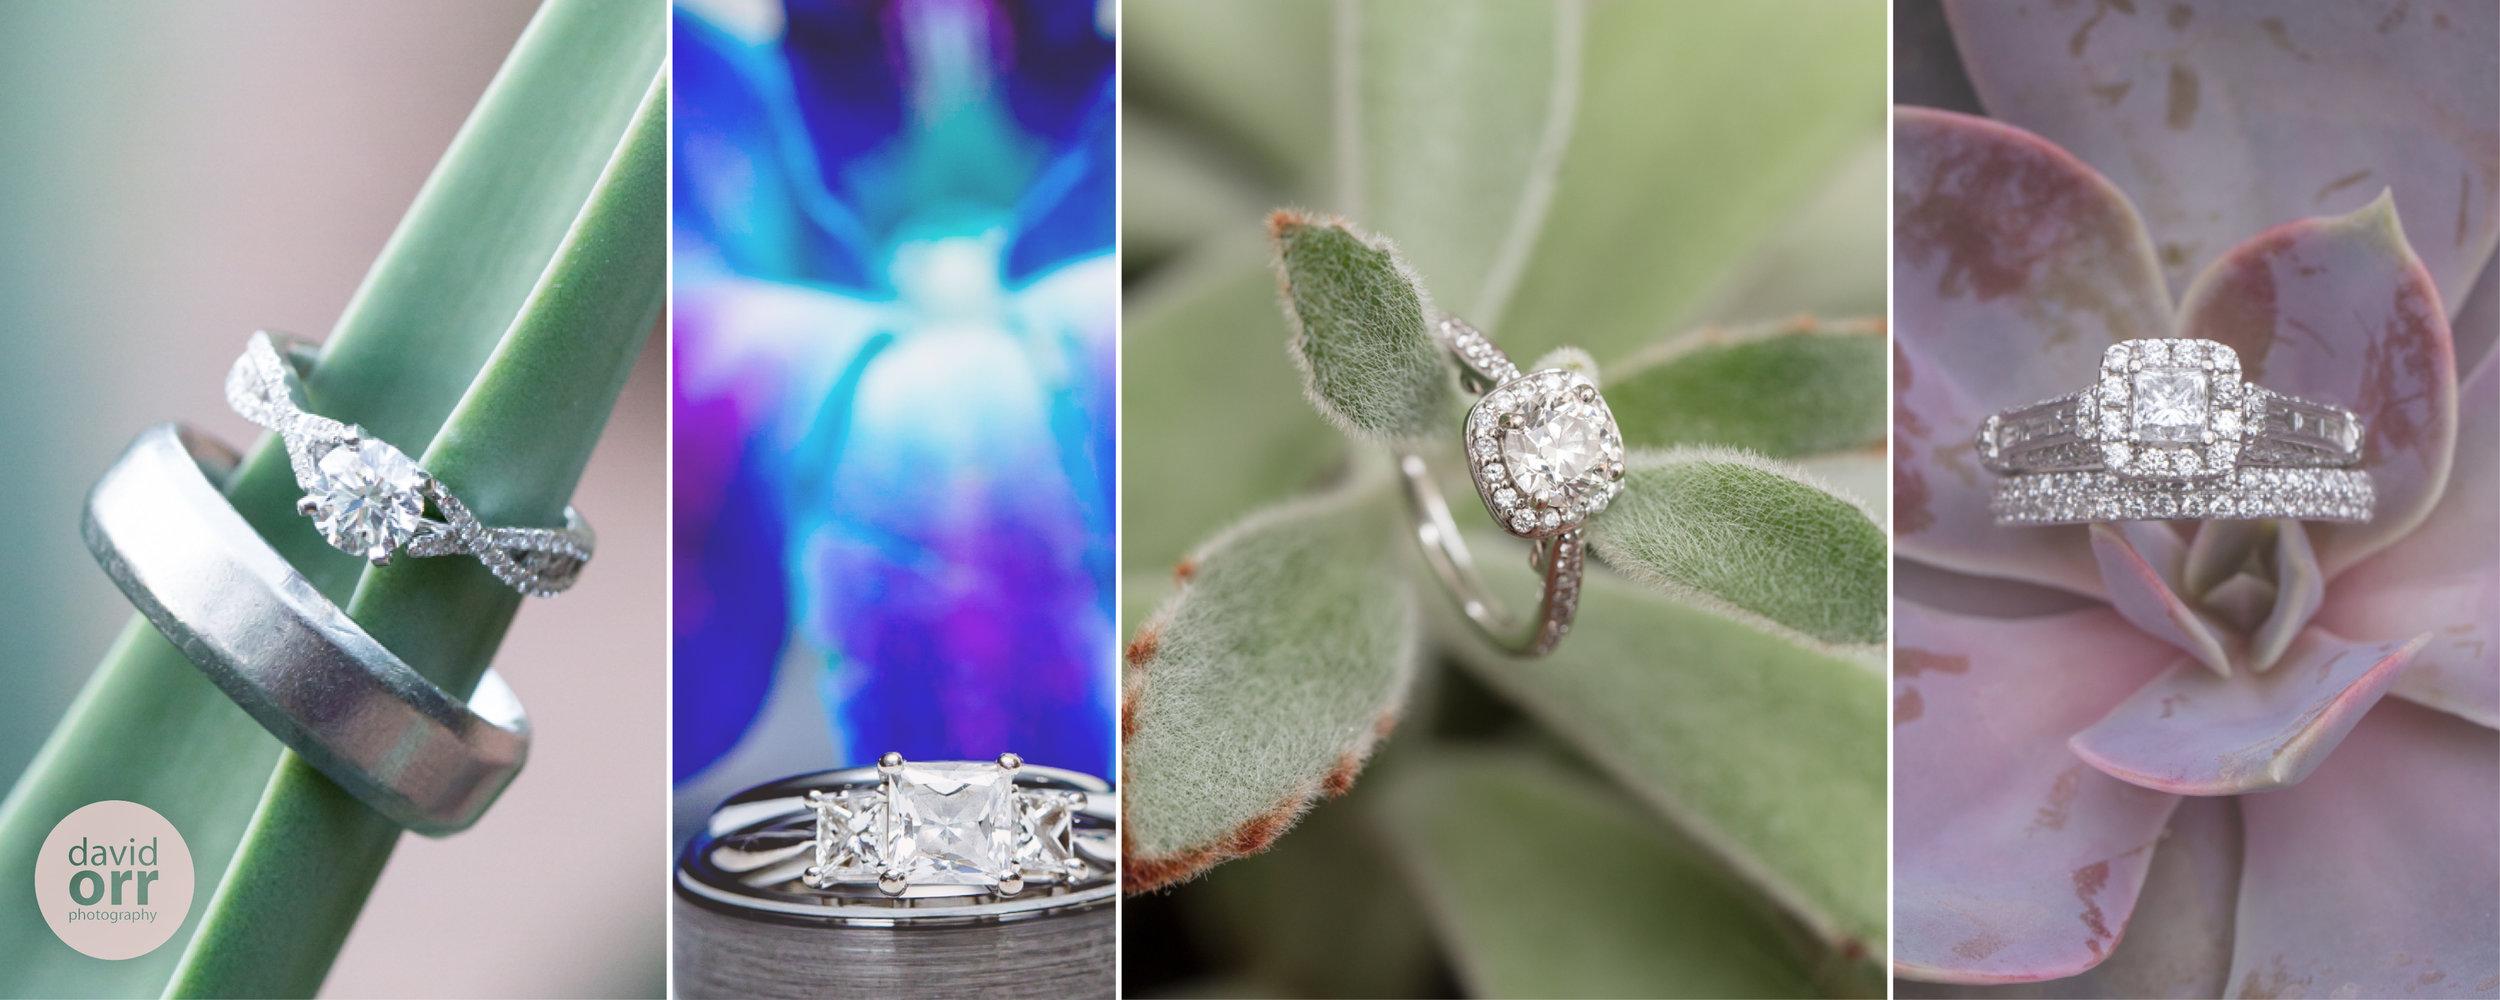 DavidOrrPhotography_Diamond-Wedding-Rings.jpg